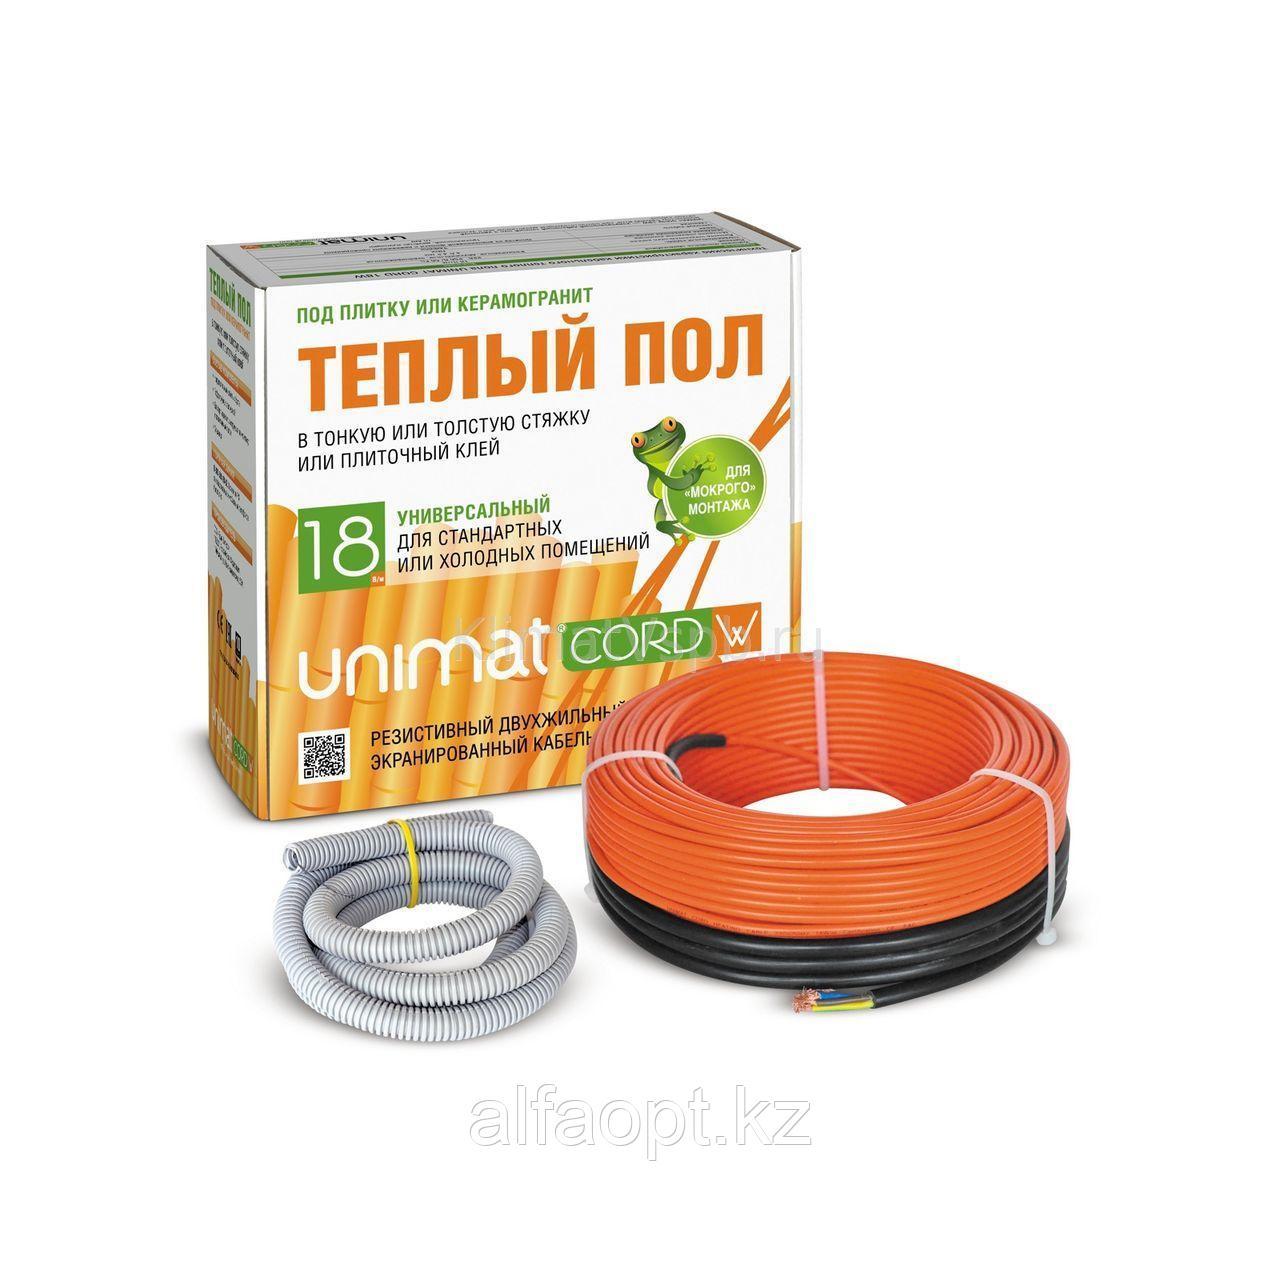 Комплект теплого пола Unimat CORD 18W-80